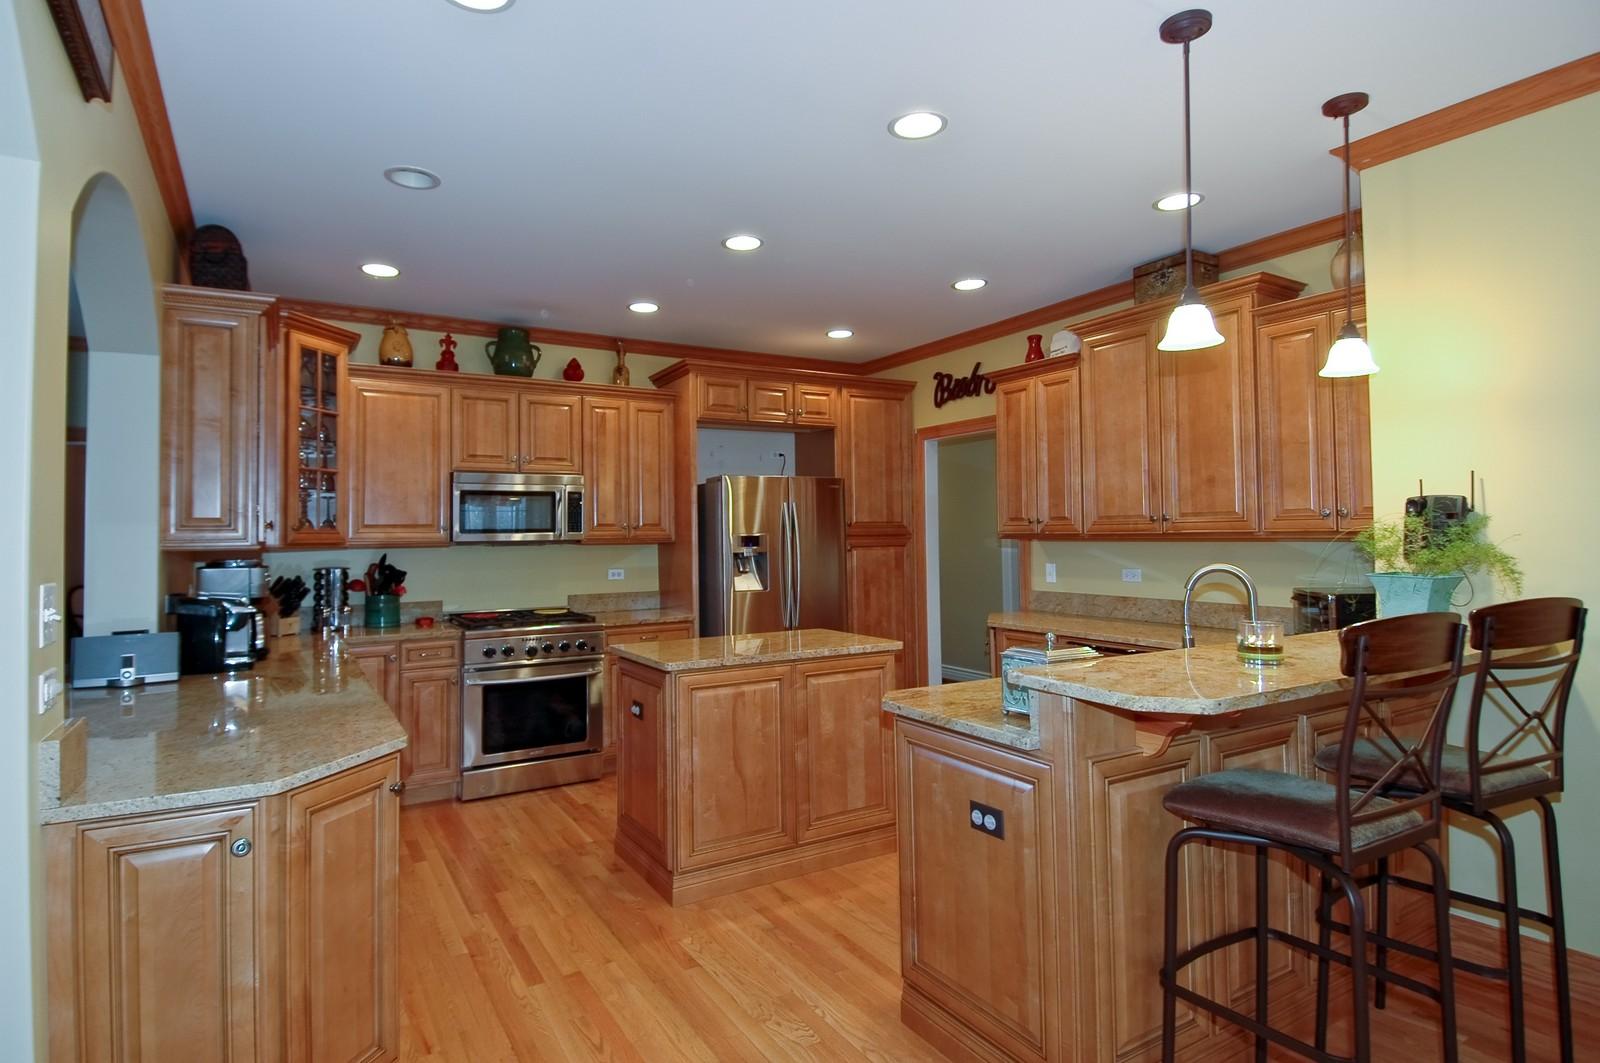 Real Estate Photography - 2100 Nish, Crystal Lake, IL, 60012 - Kitchen